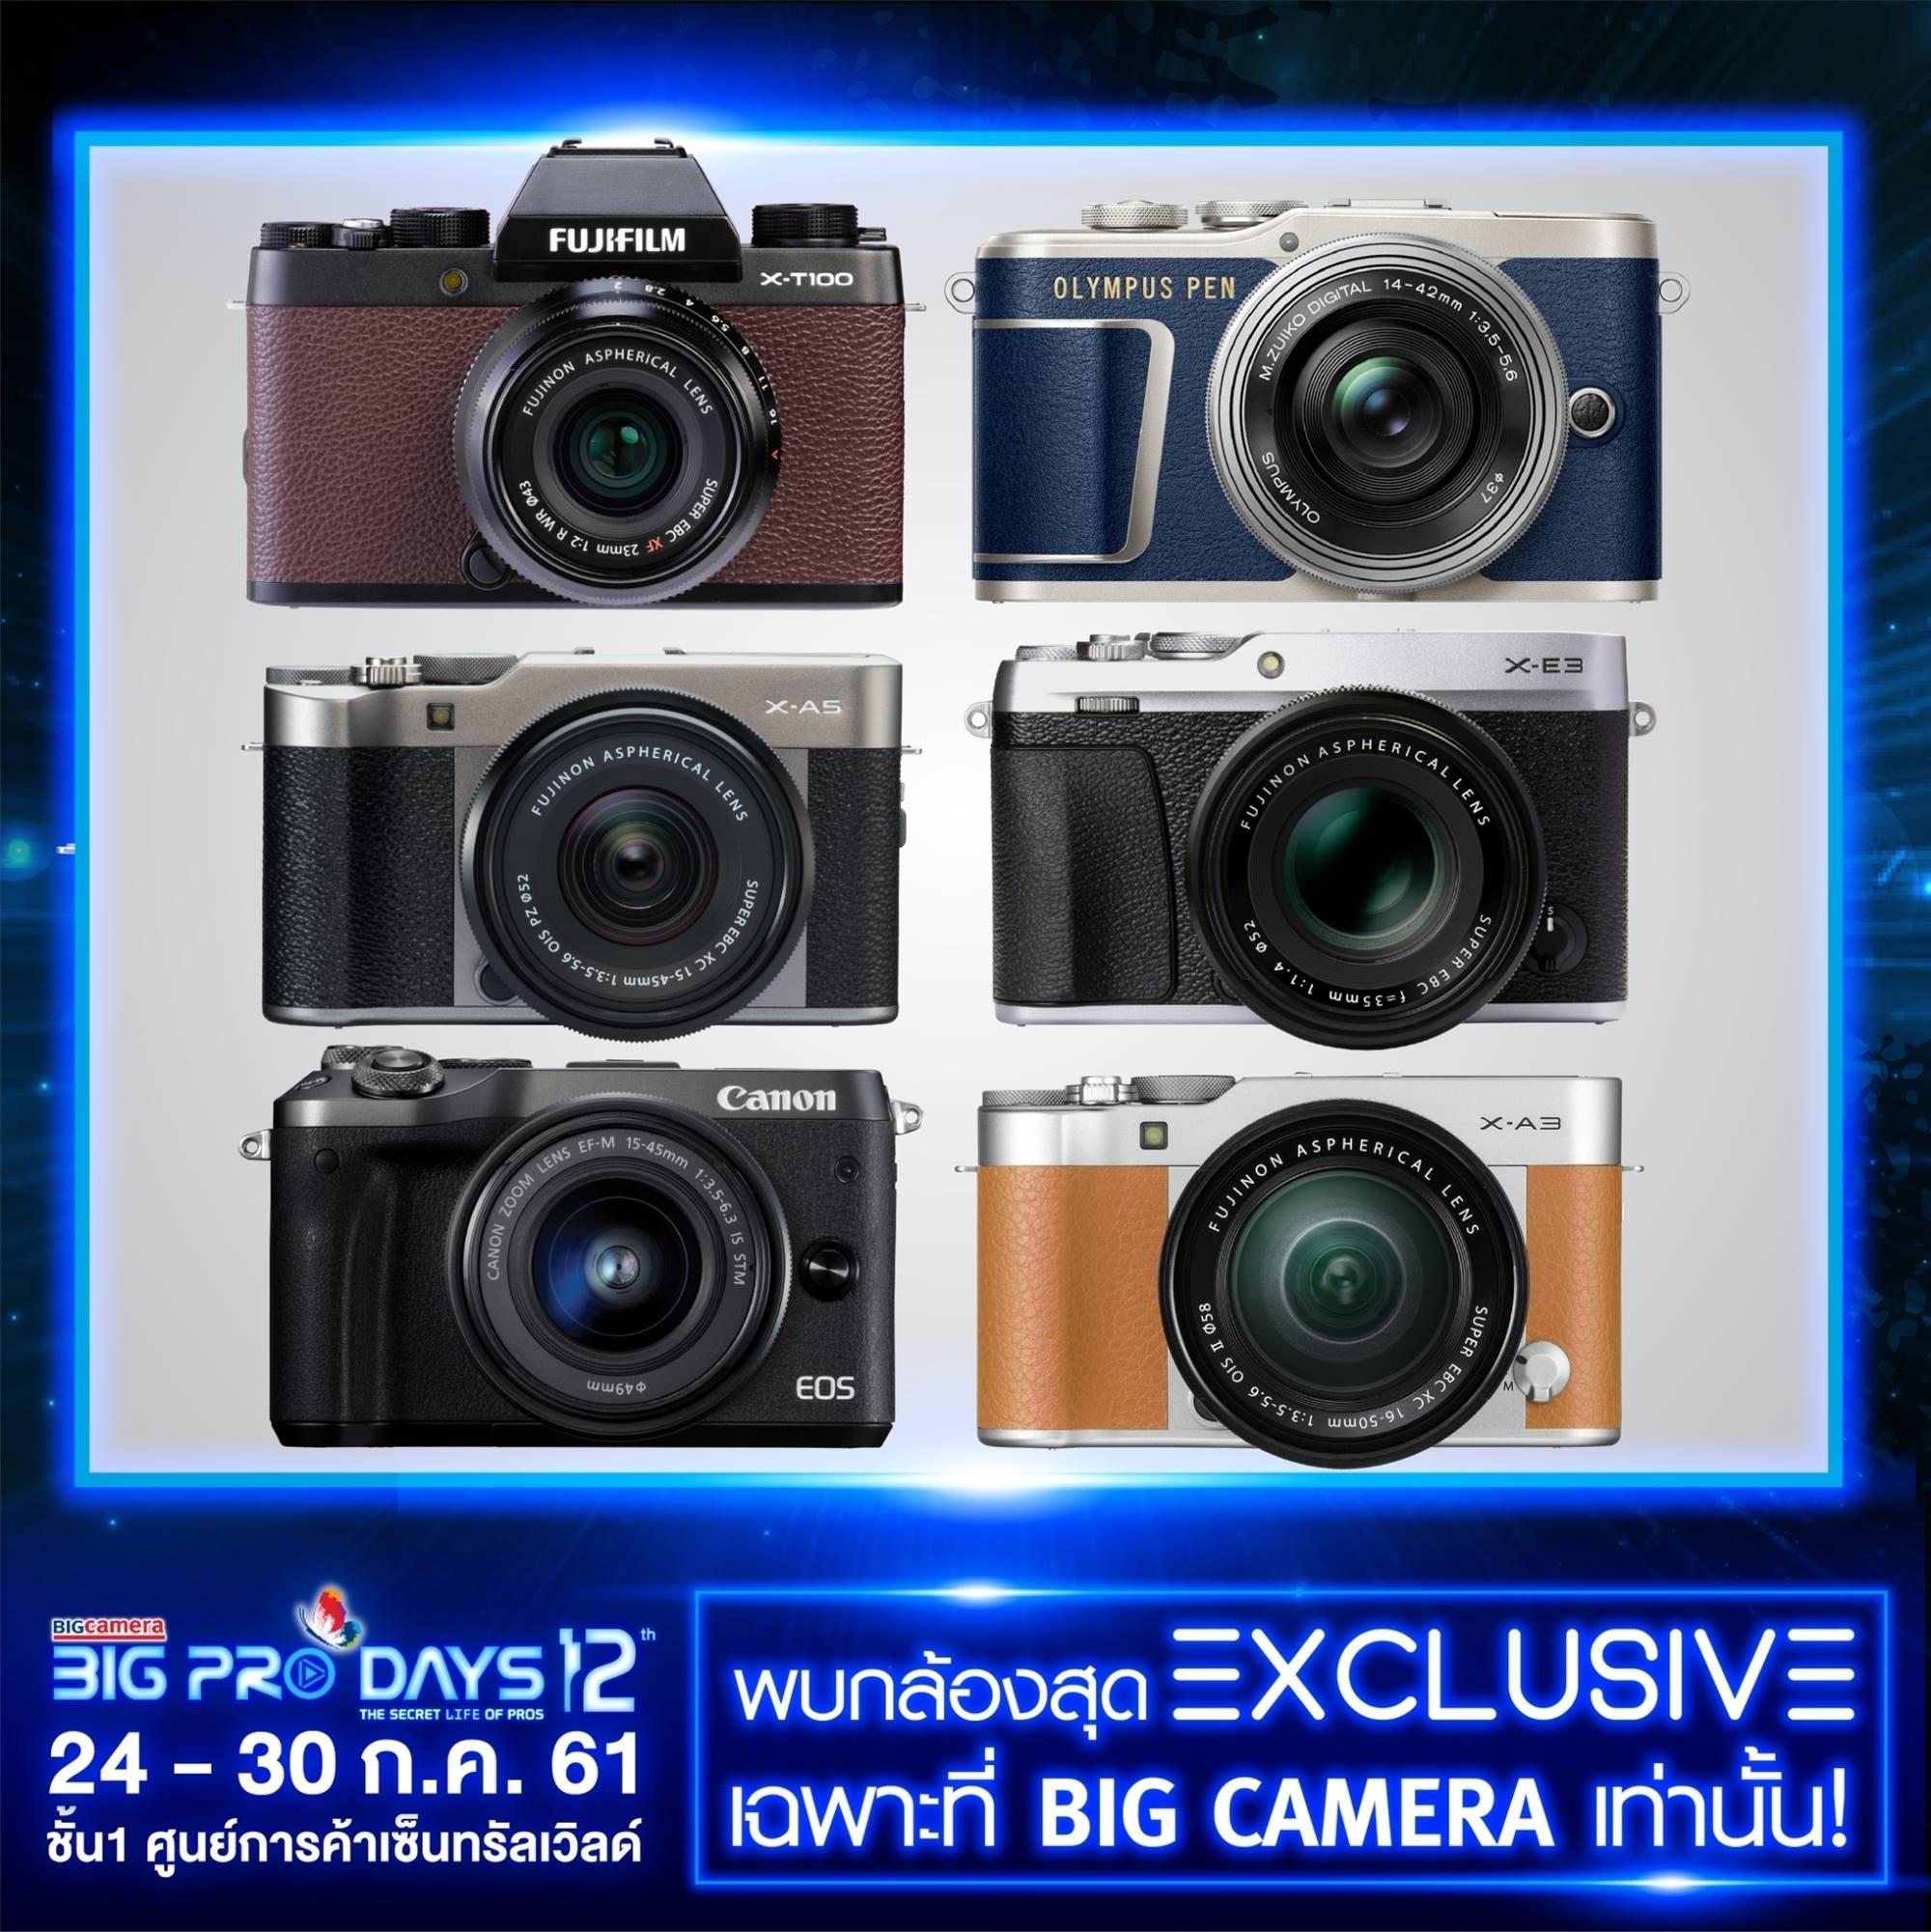 Mixmaya Big Camera Pro Days 12 Central World Fotopro X Go Plus Fujifilm T100 Brown Olympus Pen E Pl9 Denim Blue A5 Dark Silver E3 Kit 35mm F14 R Canon Eos M6 A3 Camel